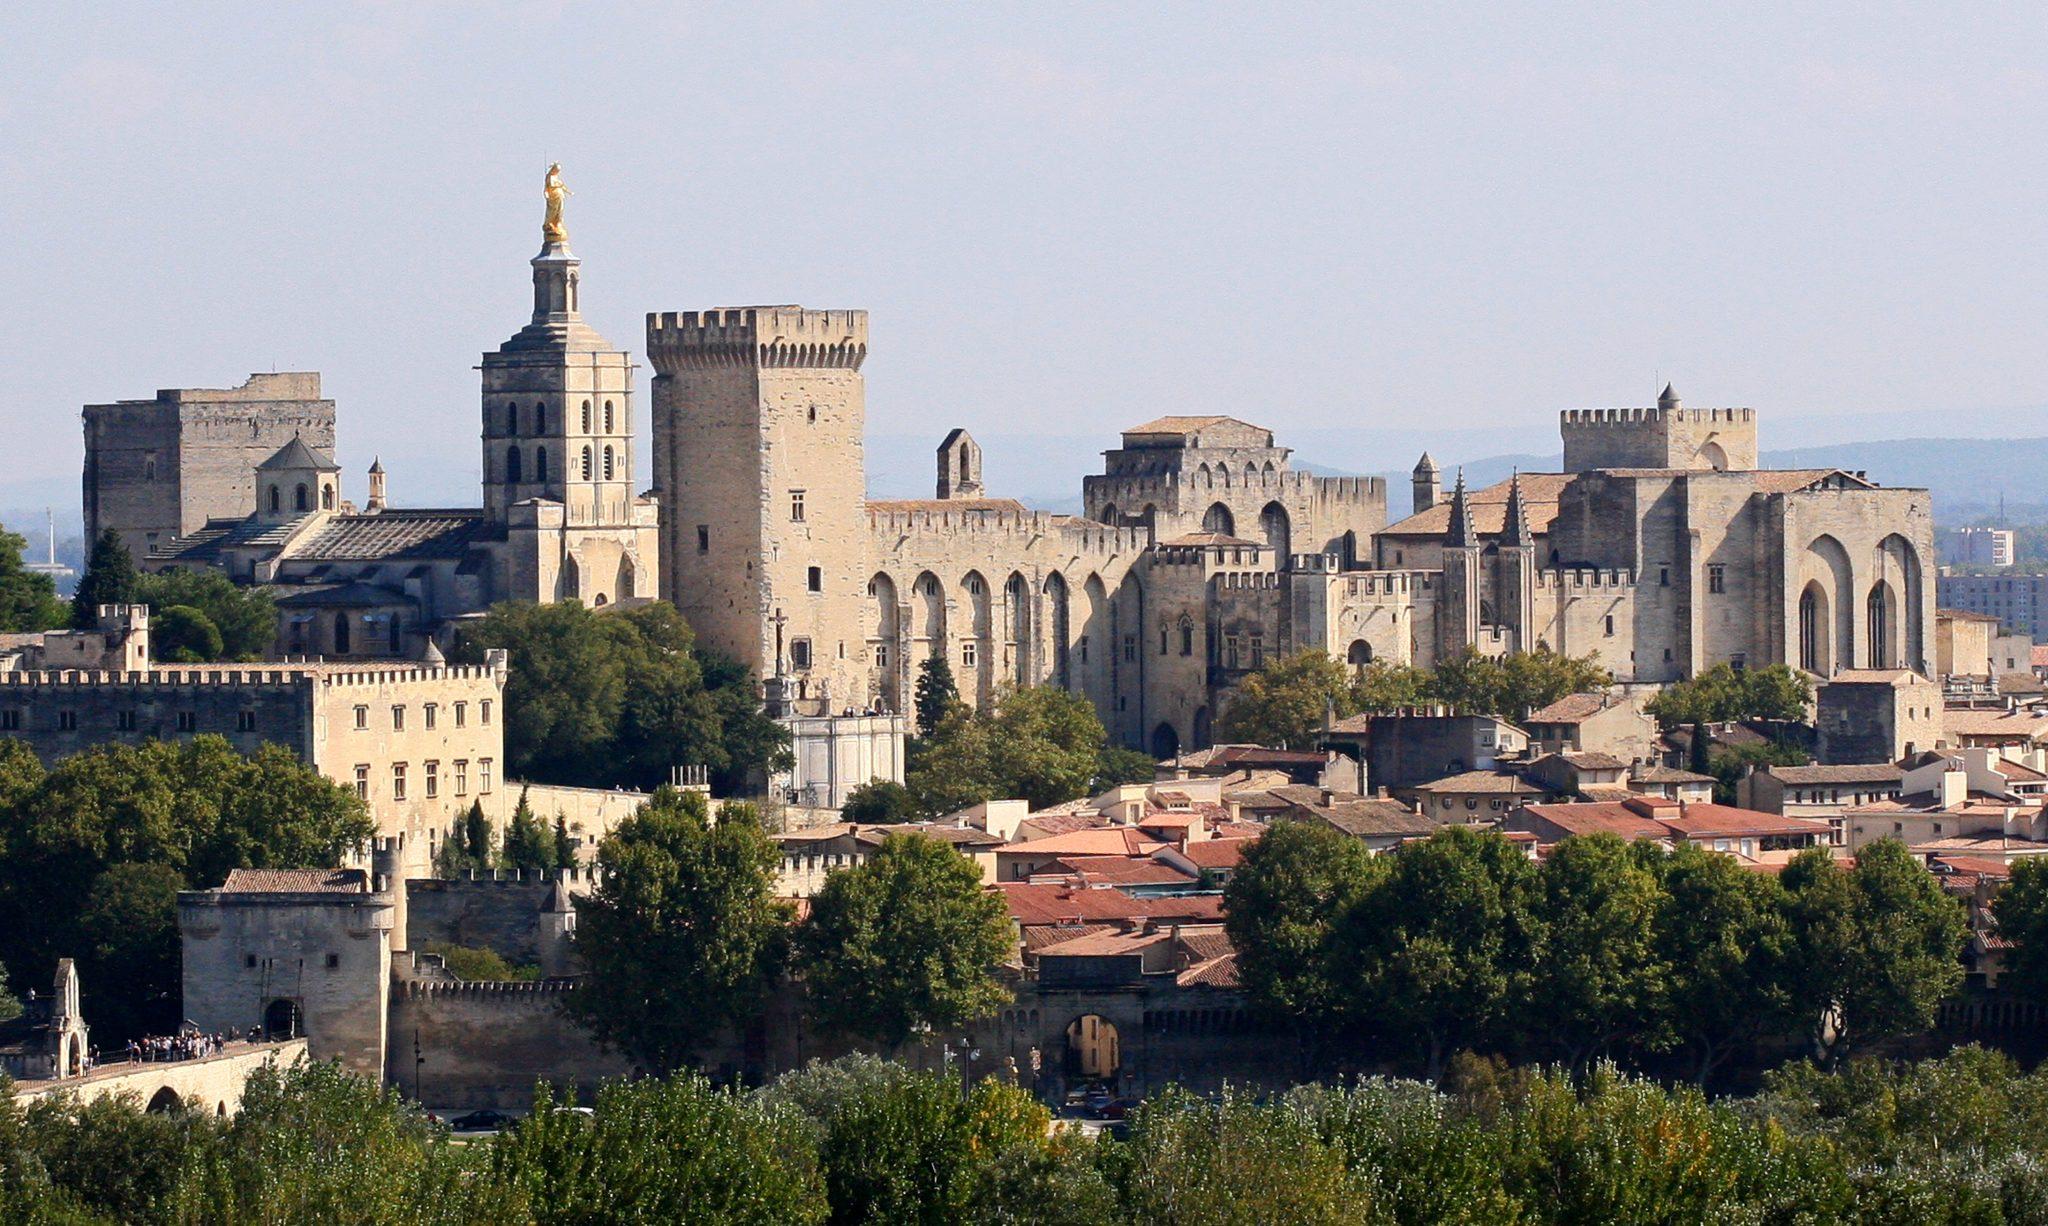 Vacanta in Franta 2019 Palatul Papilor din Avignon